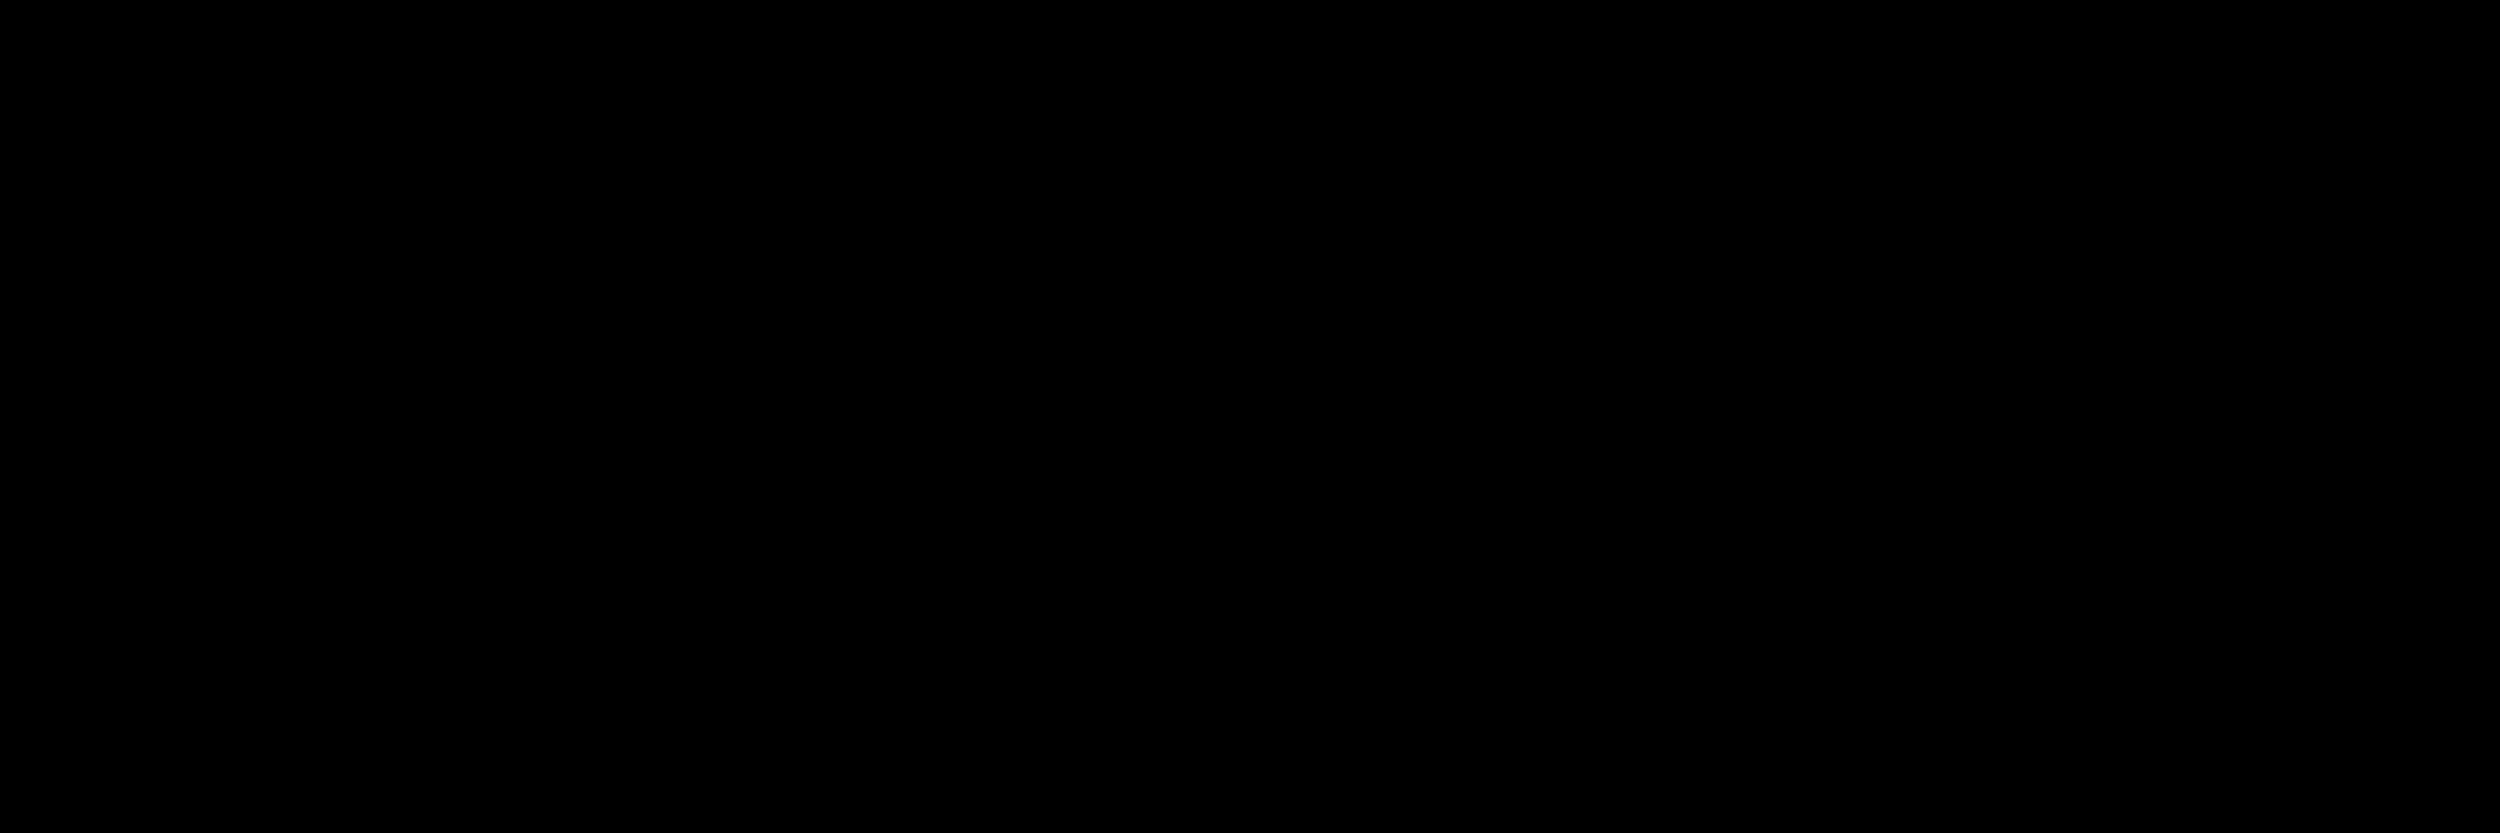 JT_title_black_transparency.png